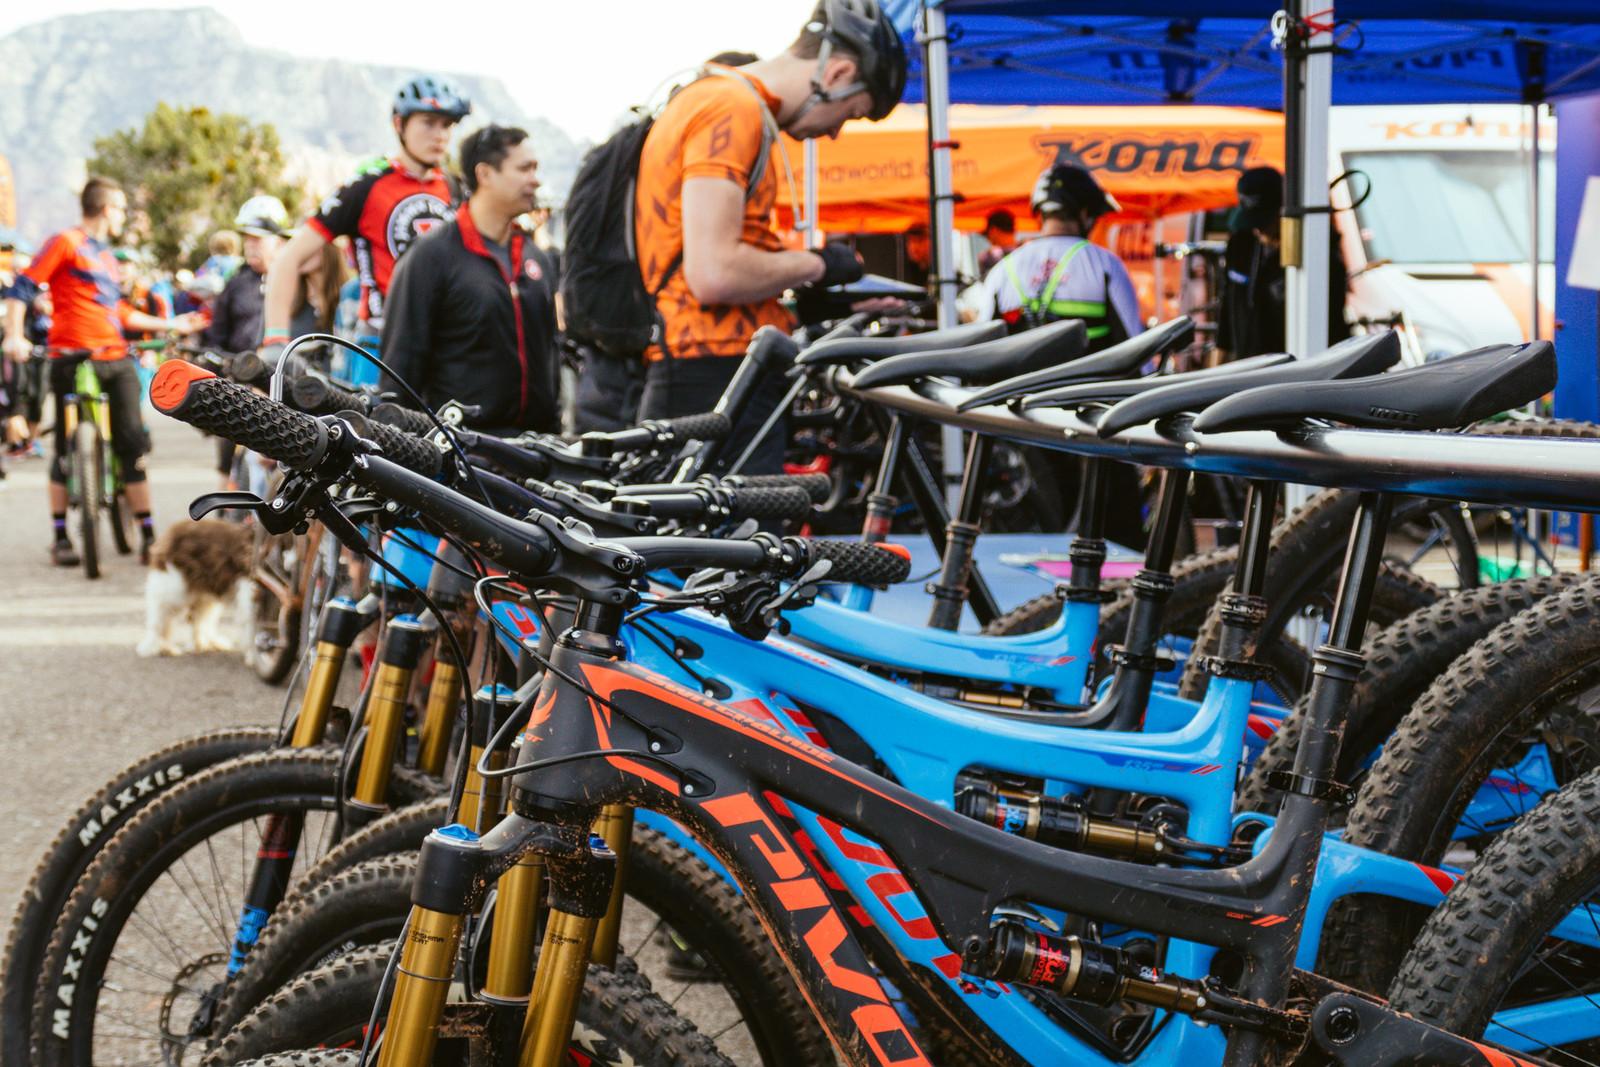 Pivot's Lineup - PIT BITS - Fresh Products from the Sedona Mountain Bike Festival - Mountain Biking Pictures - Vital MTB